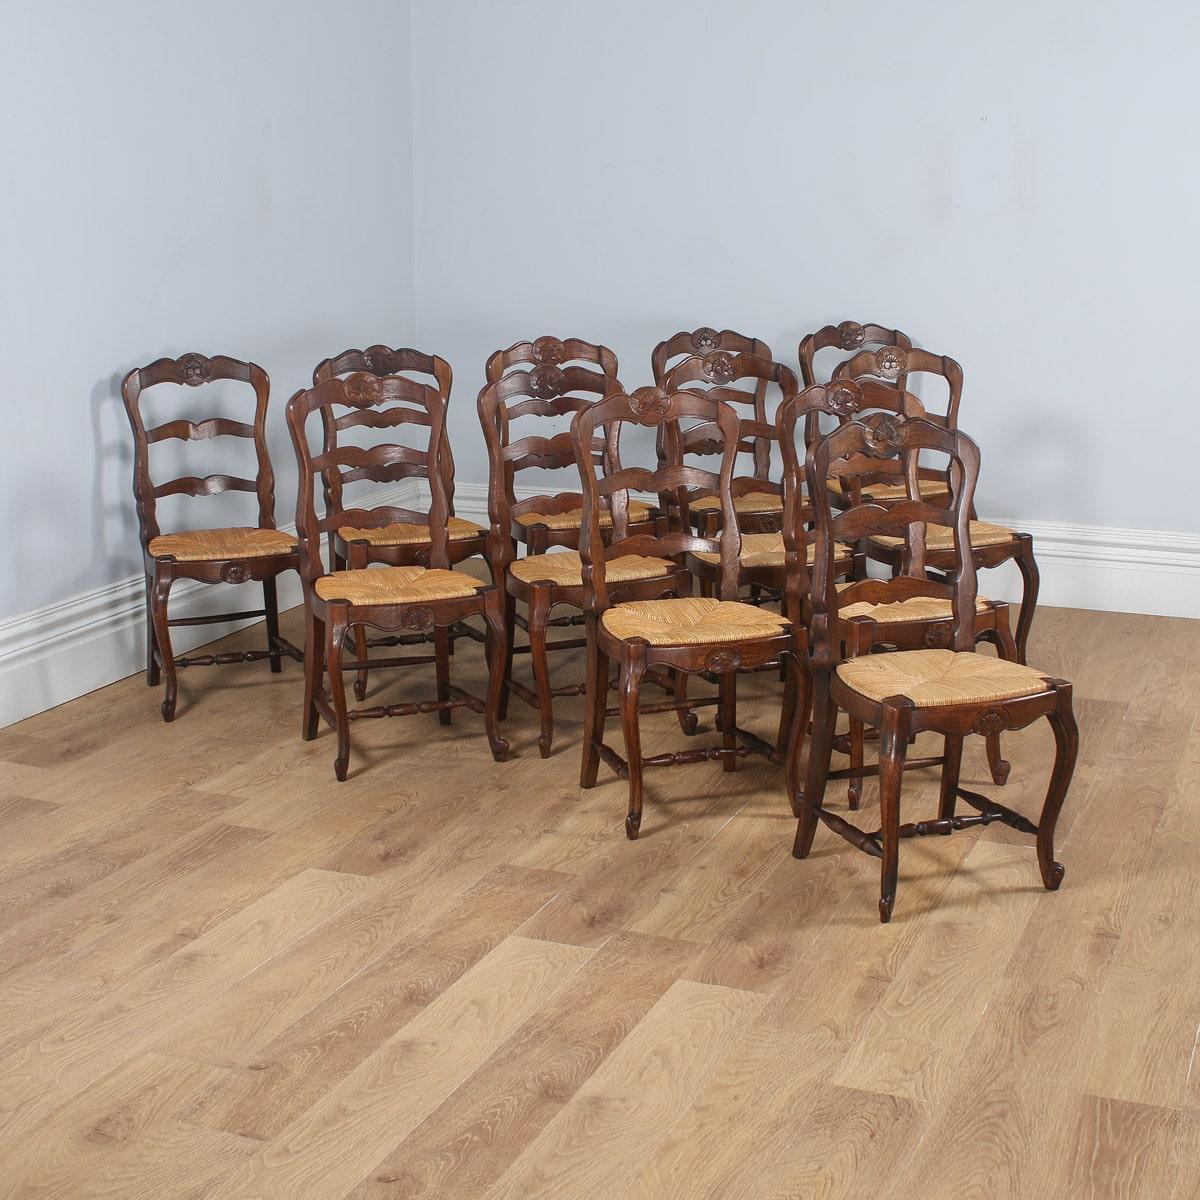 antique set of 12 french louis xv style oak ladder back kitchen